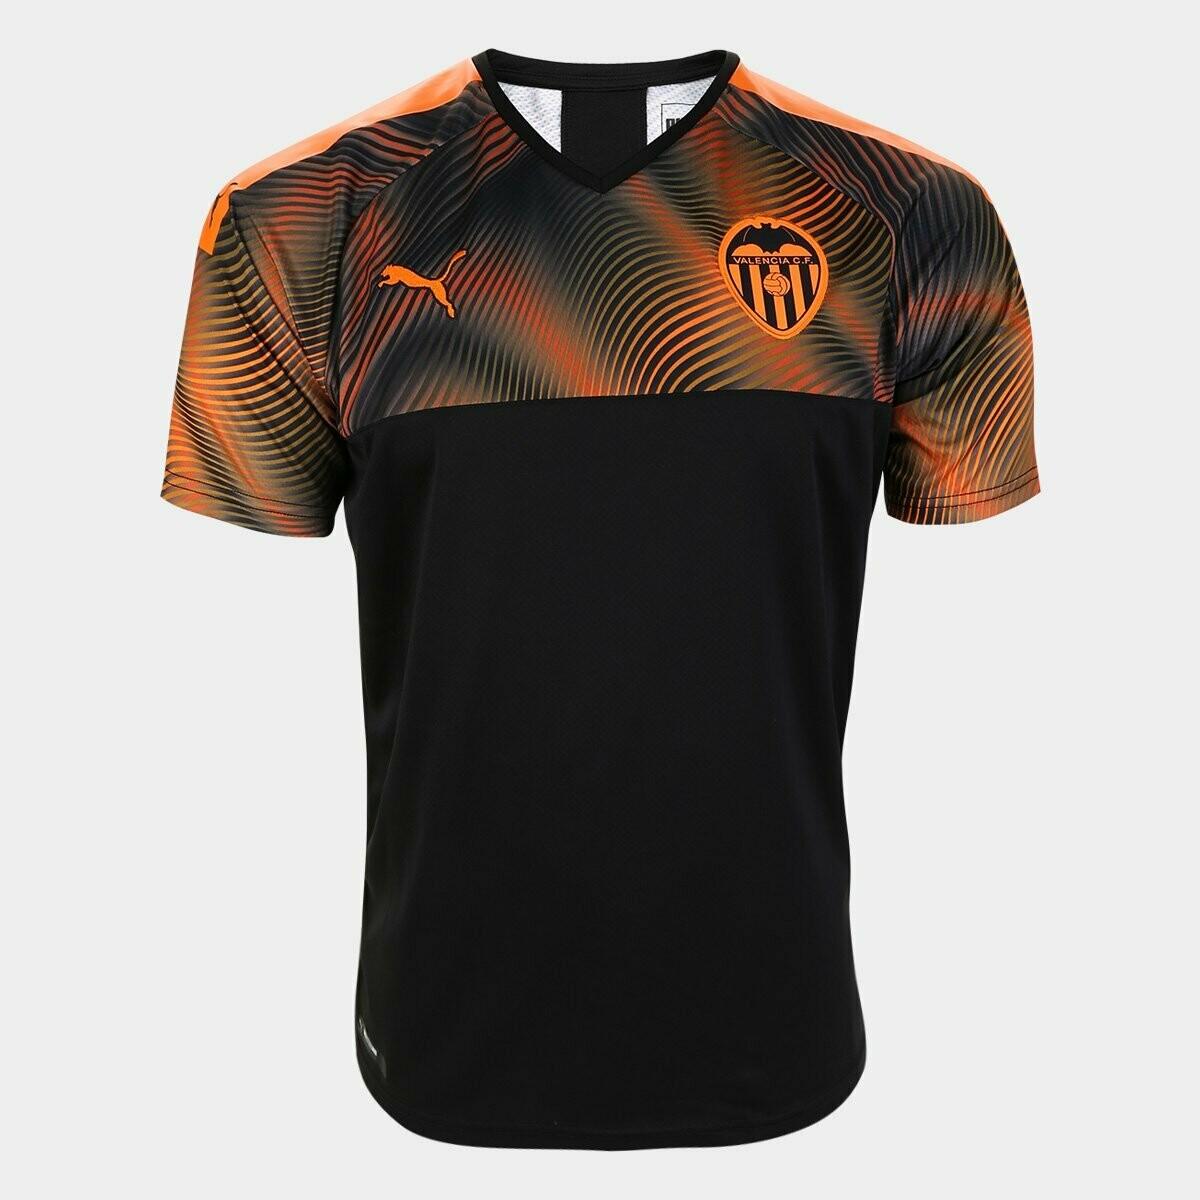 Camisa Valencia Away 19/20  Torcedor Puma Masculina - Preto e Laranja